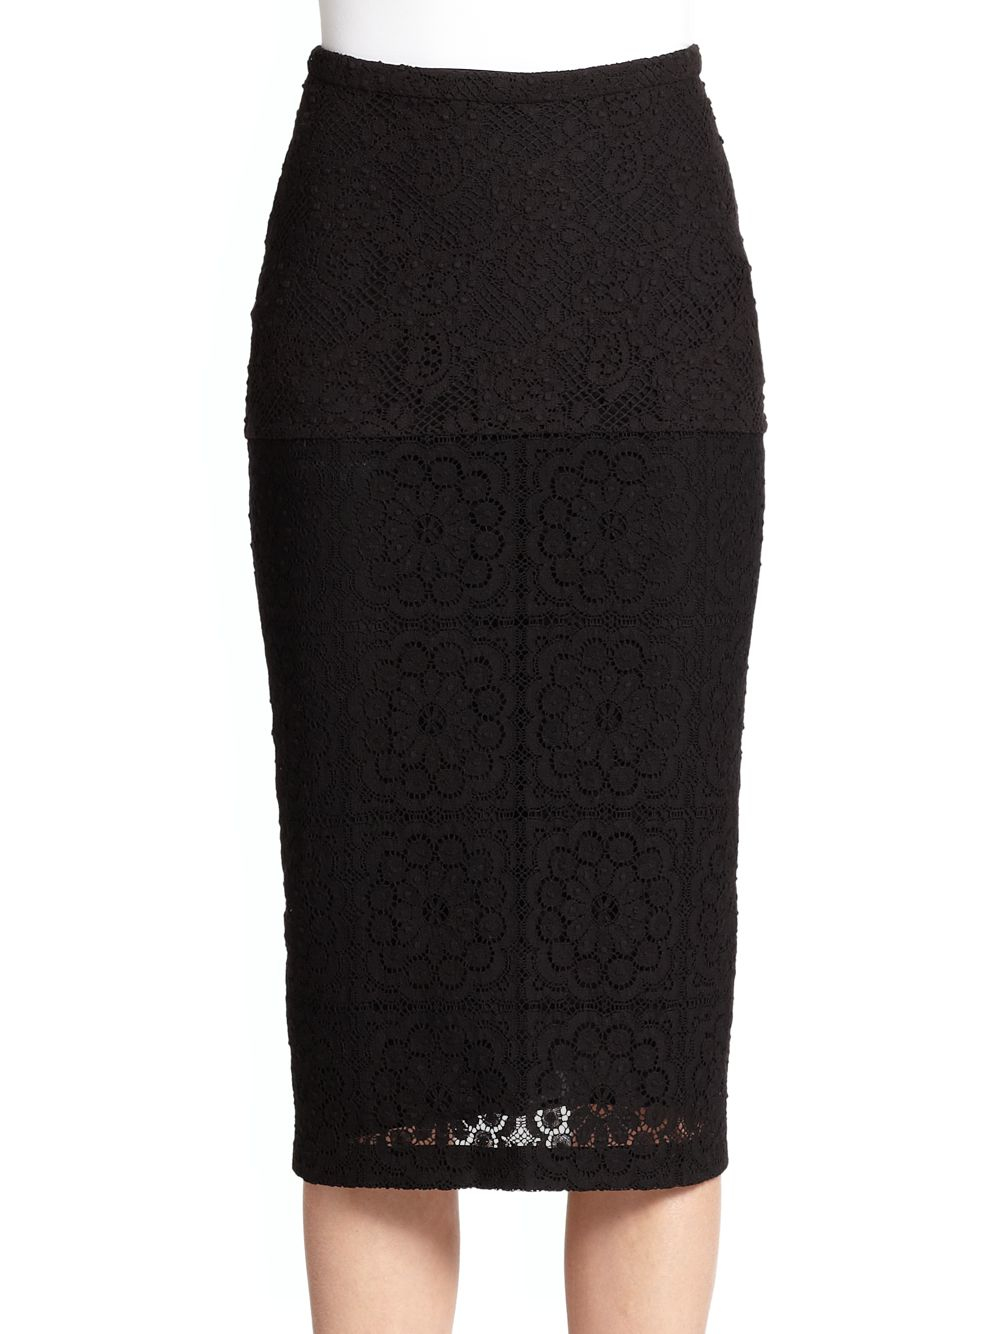 burberry prorsum crochet lace pencil skirt in black lyst